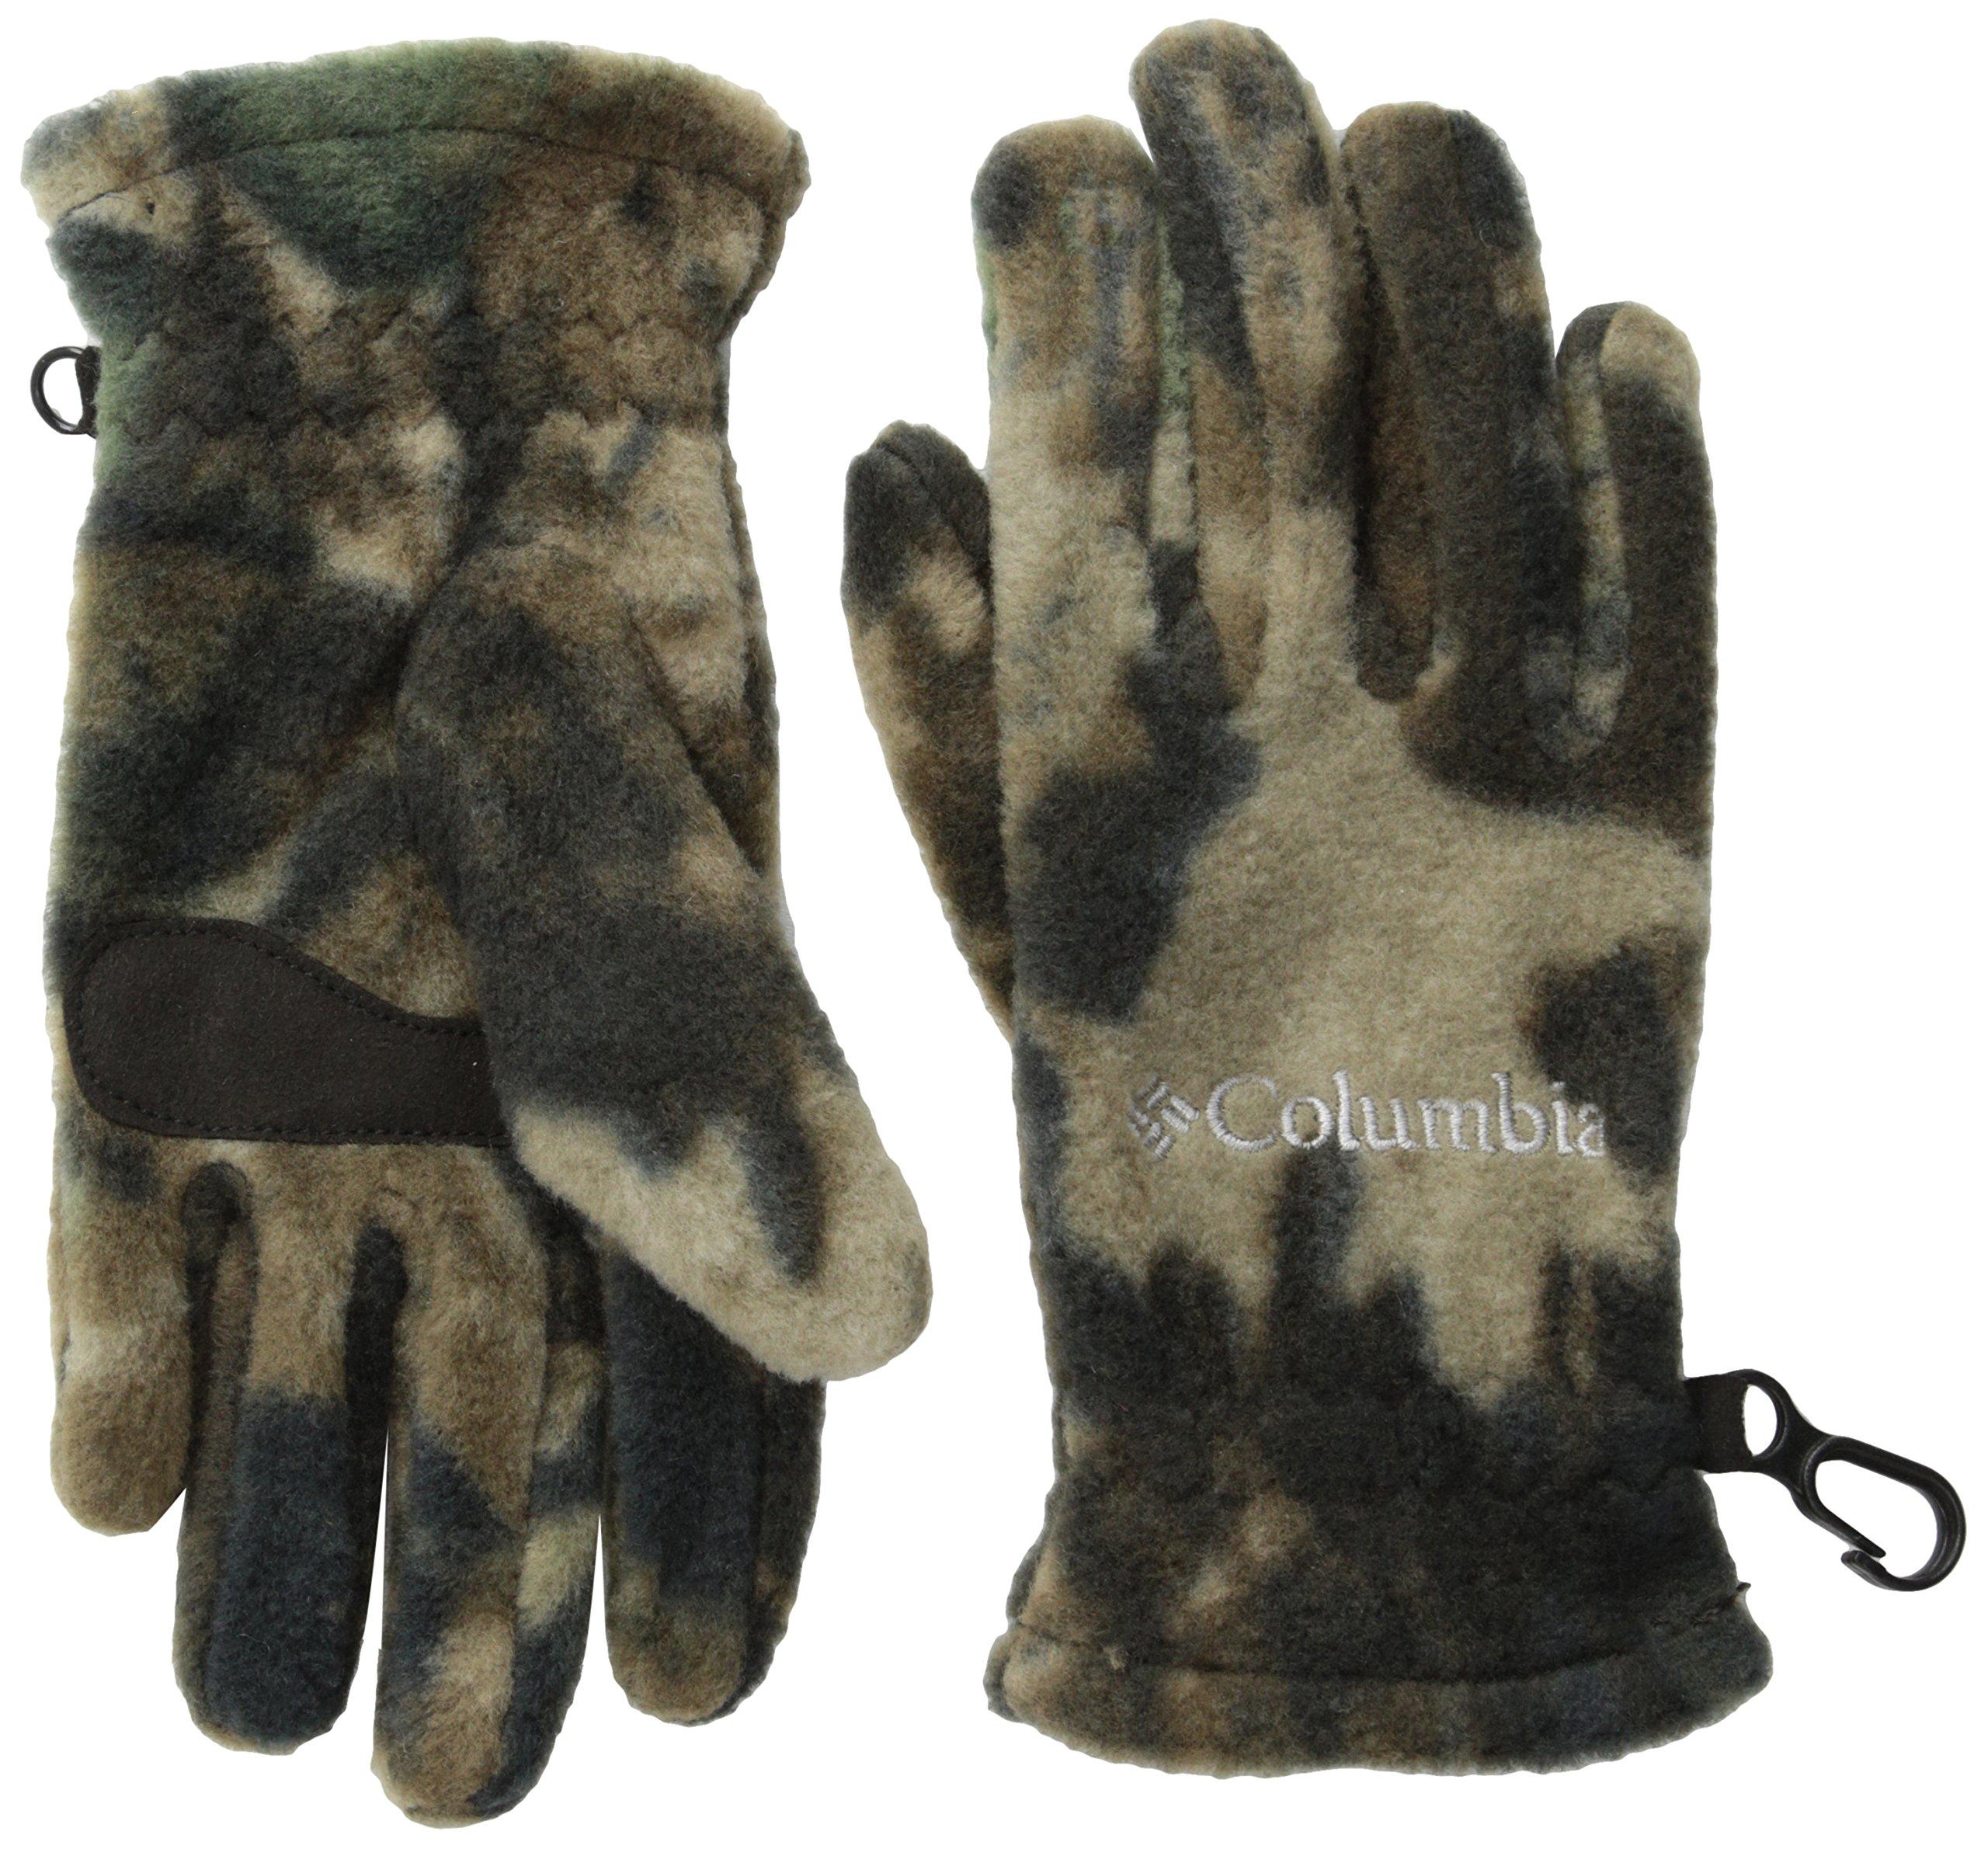 Columbia Boys' Youth Fast Trek Glove, Timberwolf, Medium by Columbia